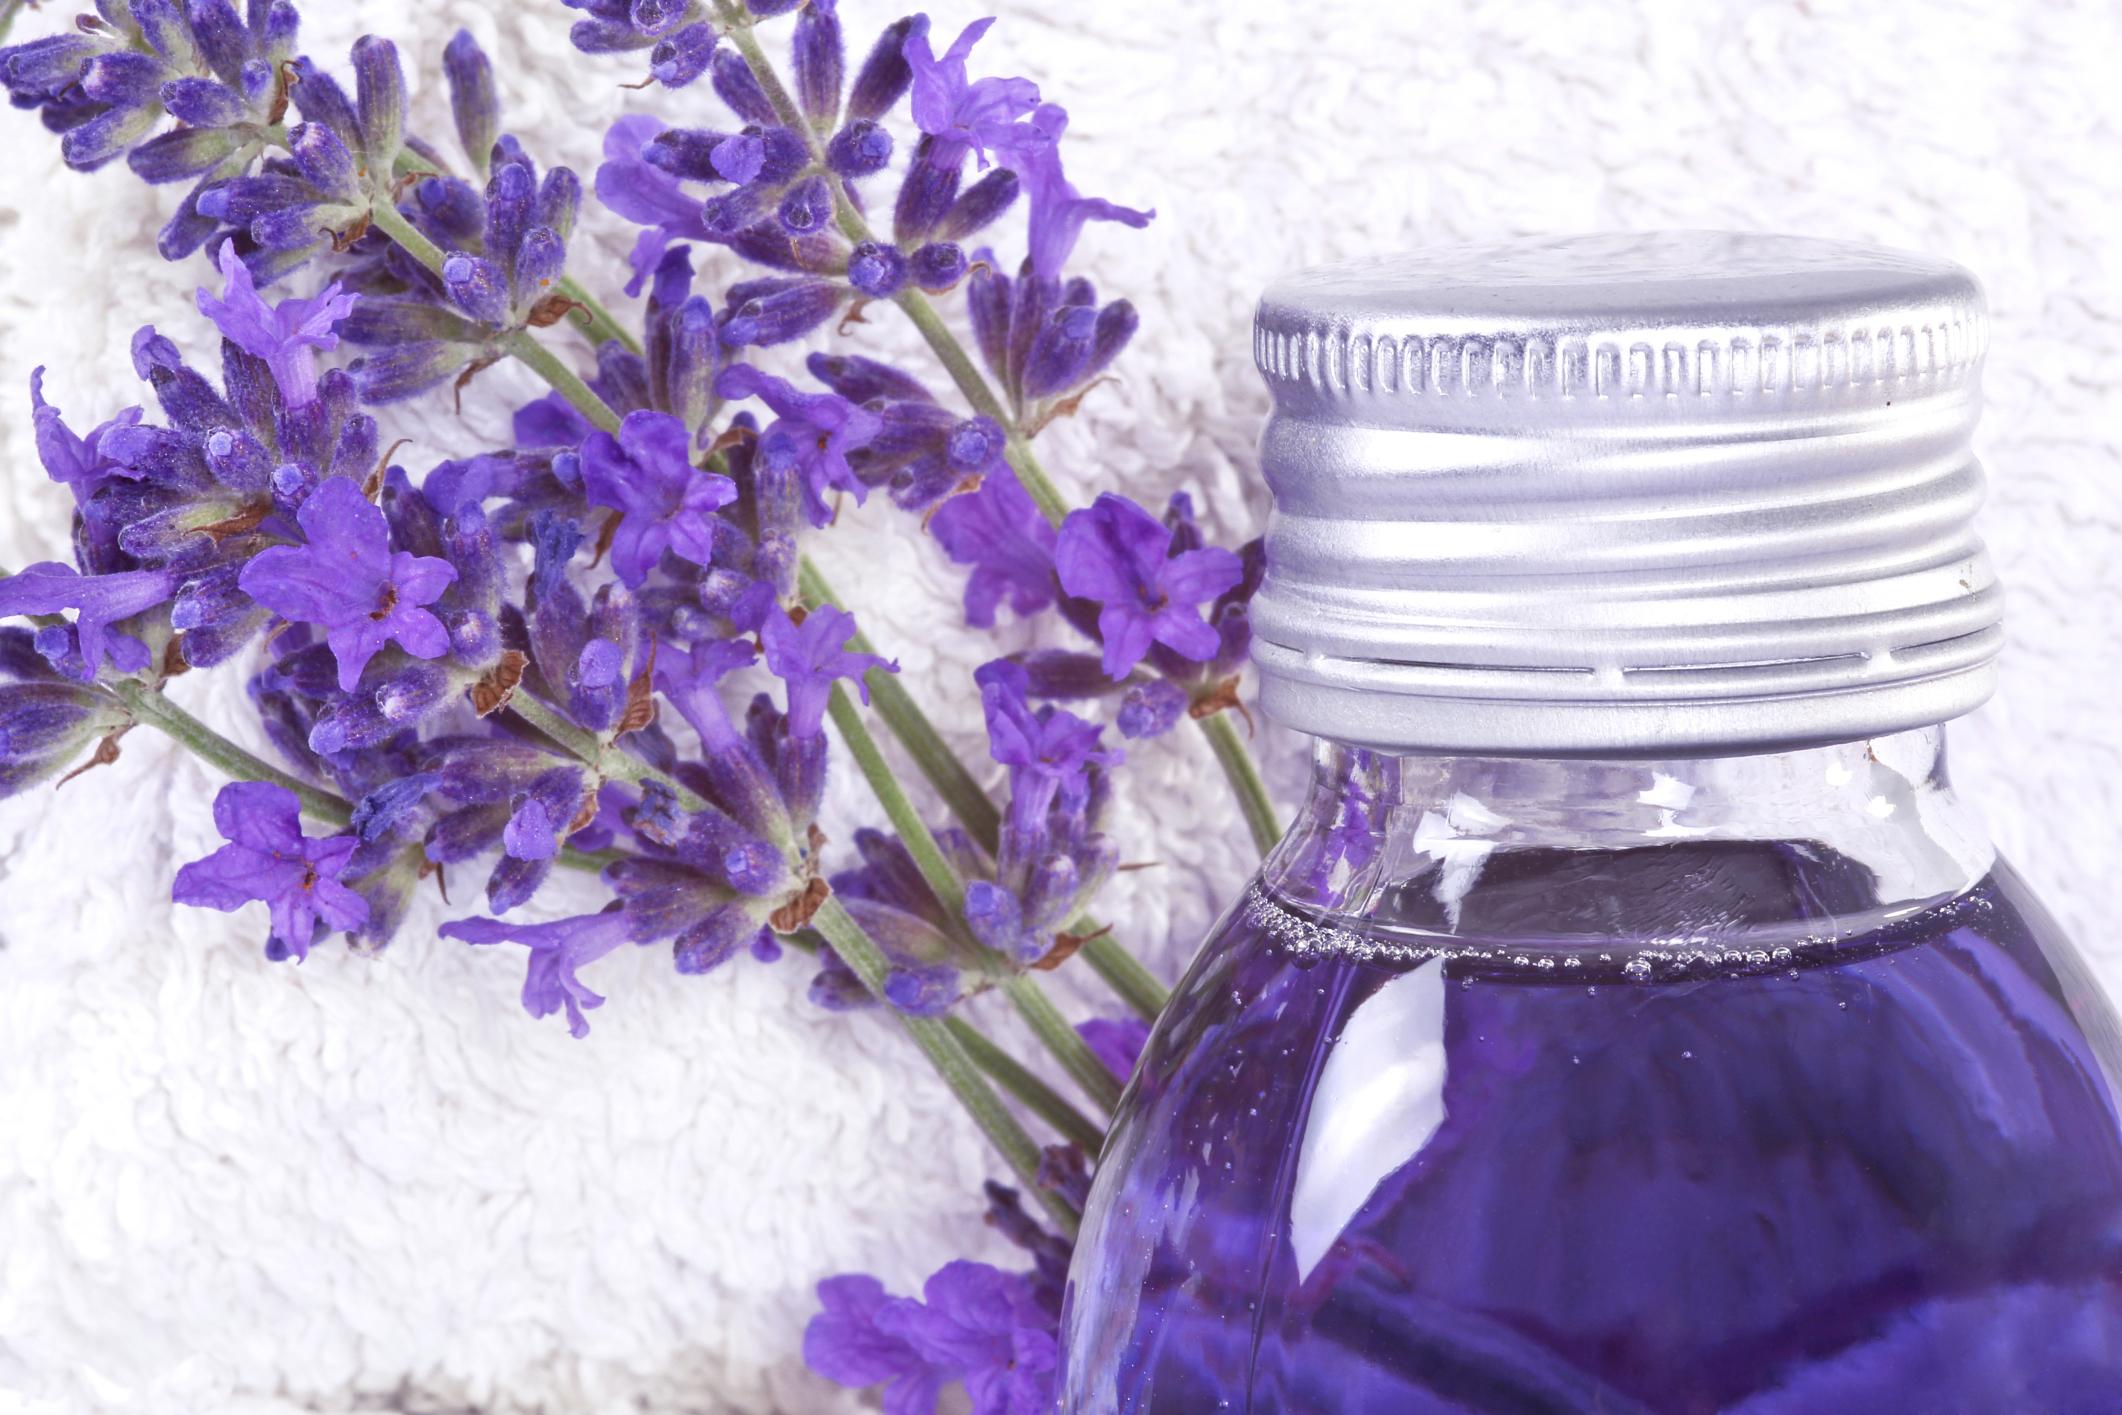 Lavender Oil As A Bug Repellent Leaftv